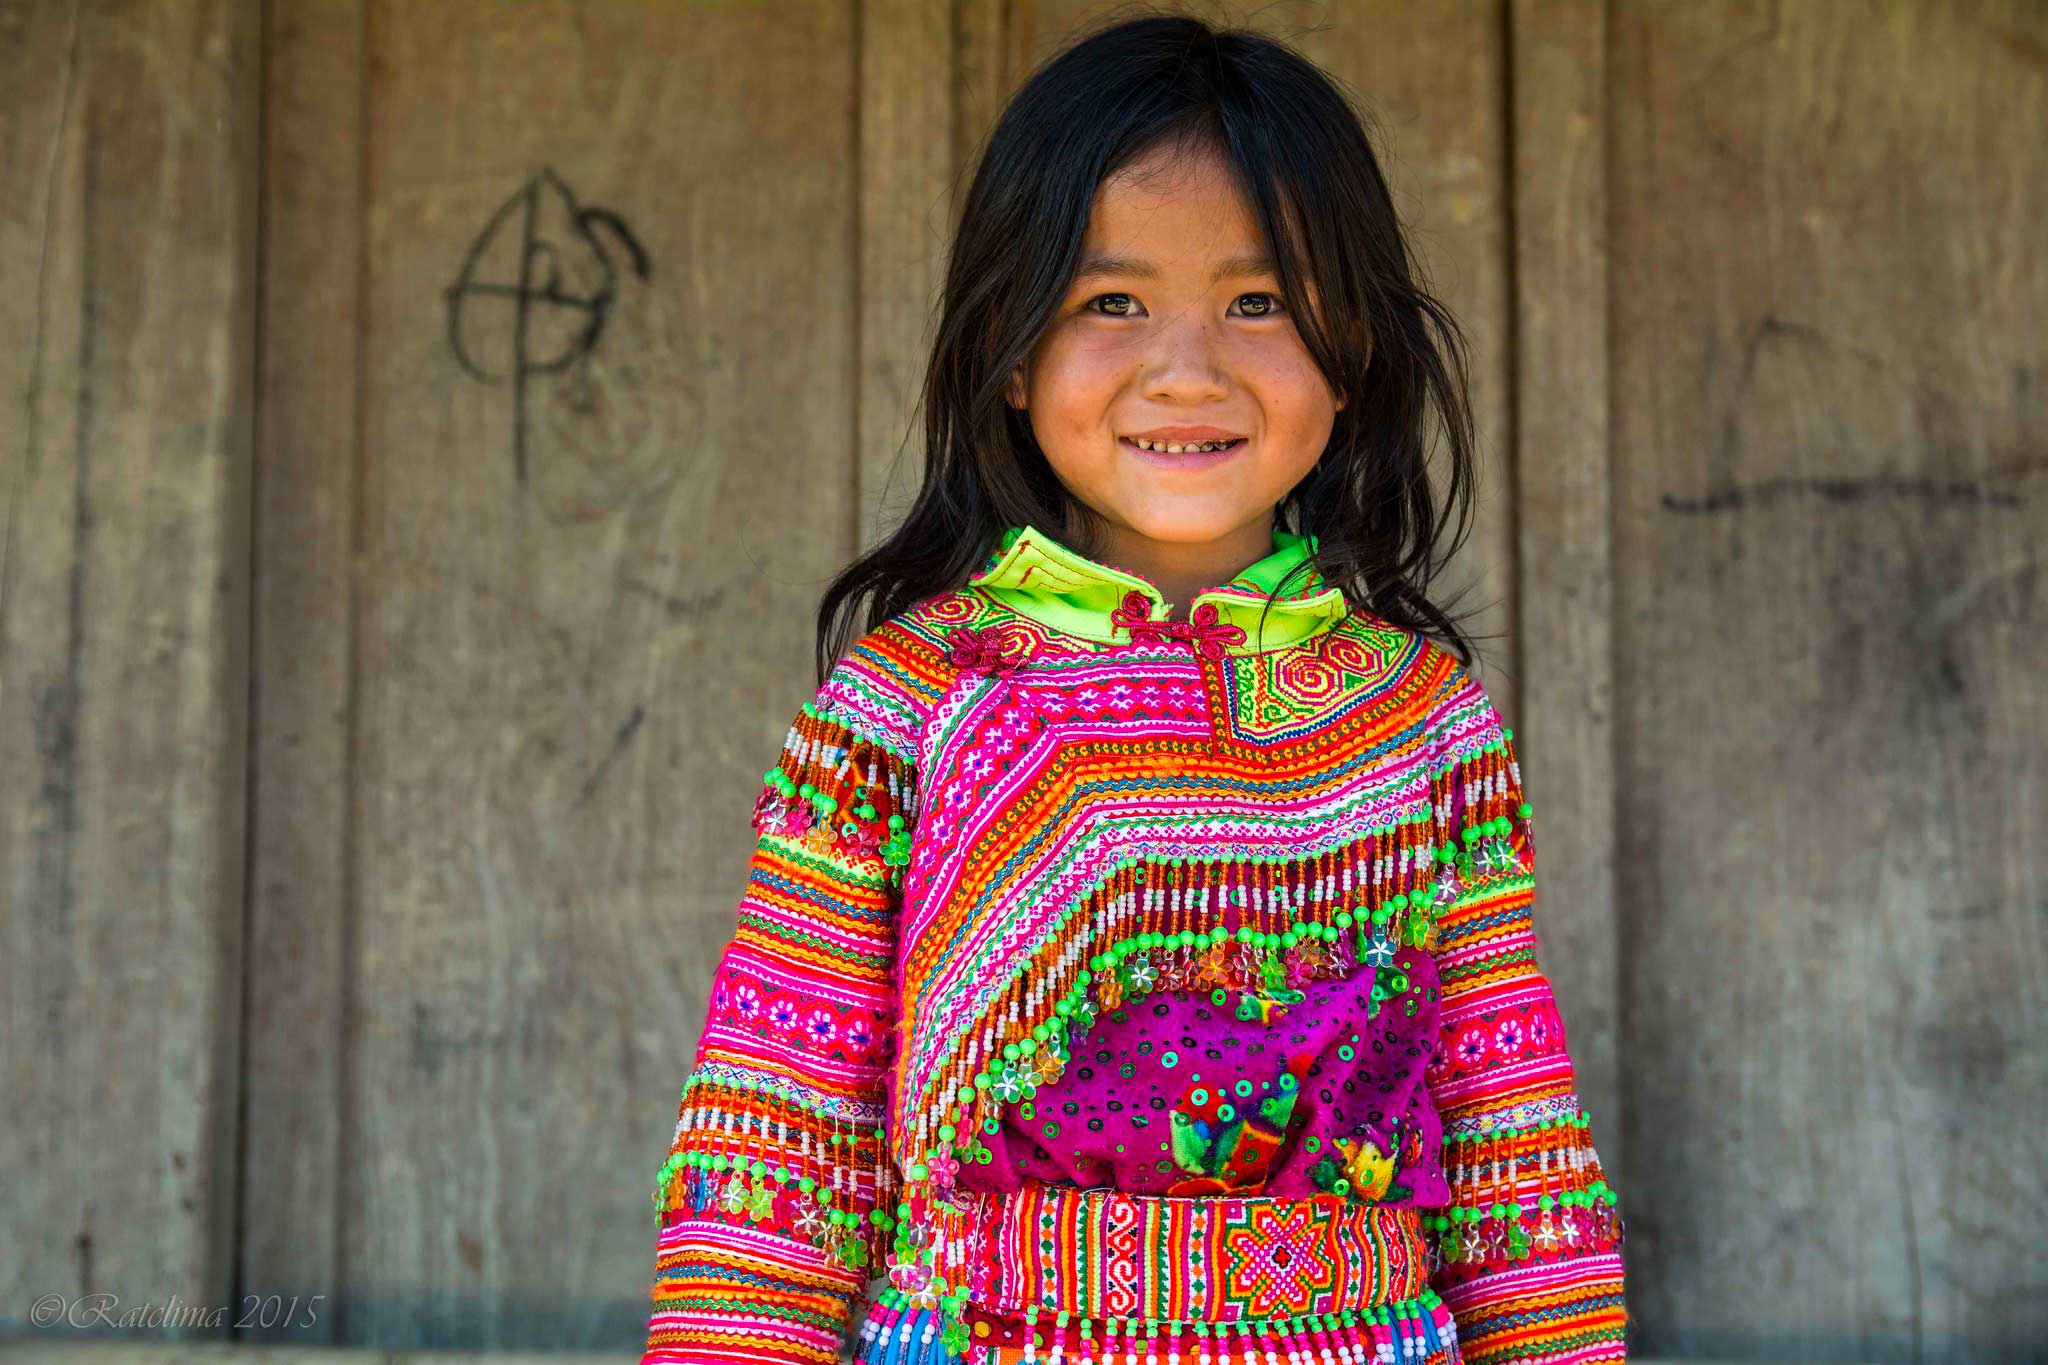 Jeune fille Hmong, Dak Lak, Vietnam